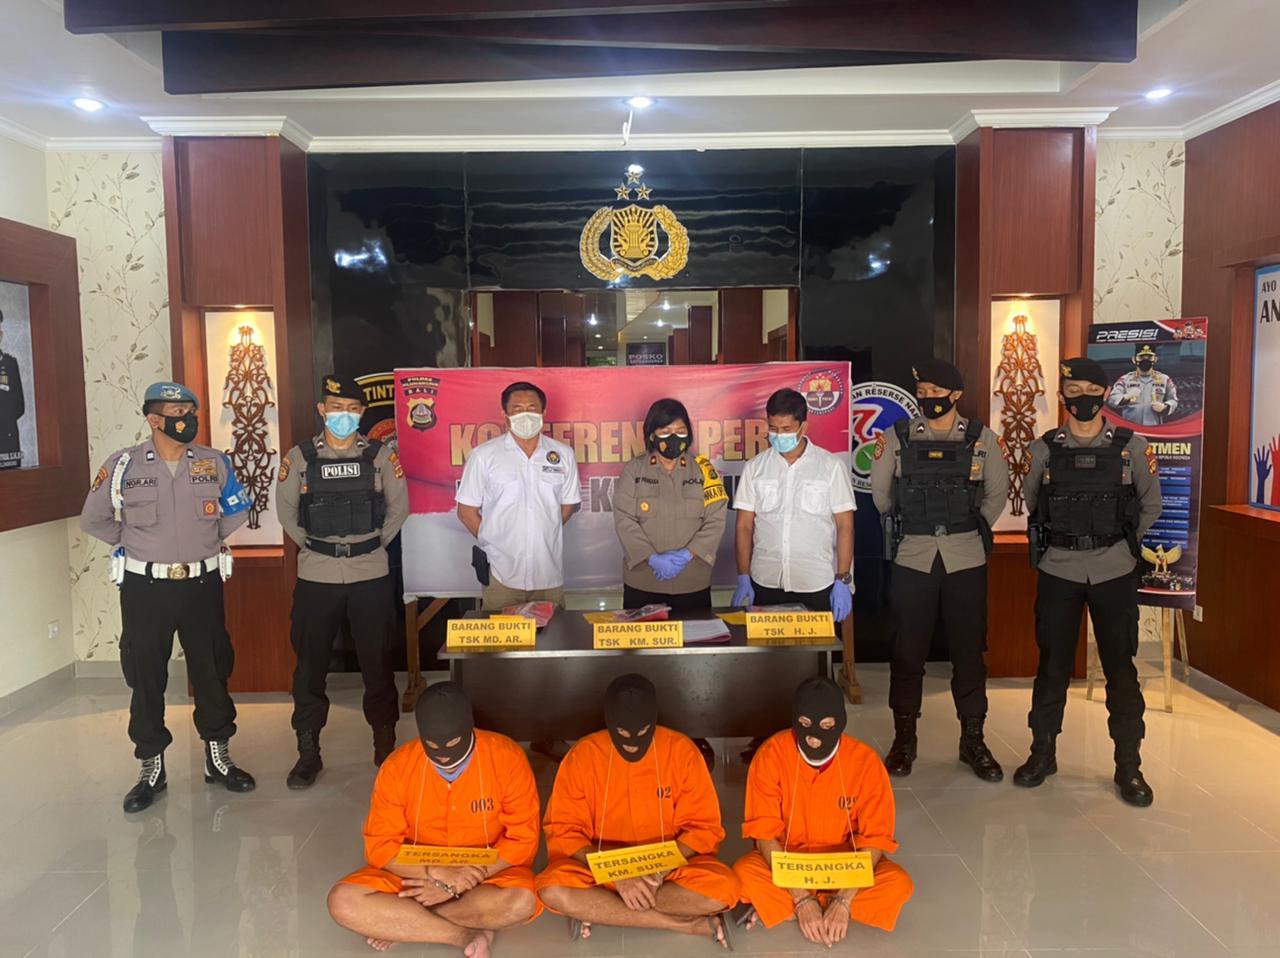 WAKAPOLRES Klungkung, Kompol Luh Ketut Amy Ramayathi Prakasa, saat menggelar press release penangkapan tiga tersangka kasus narkoba, Senin (1/3/2021). Foto: ist